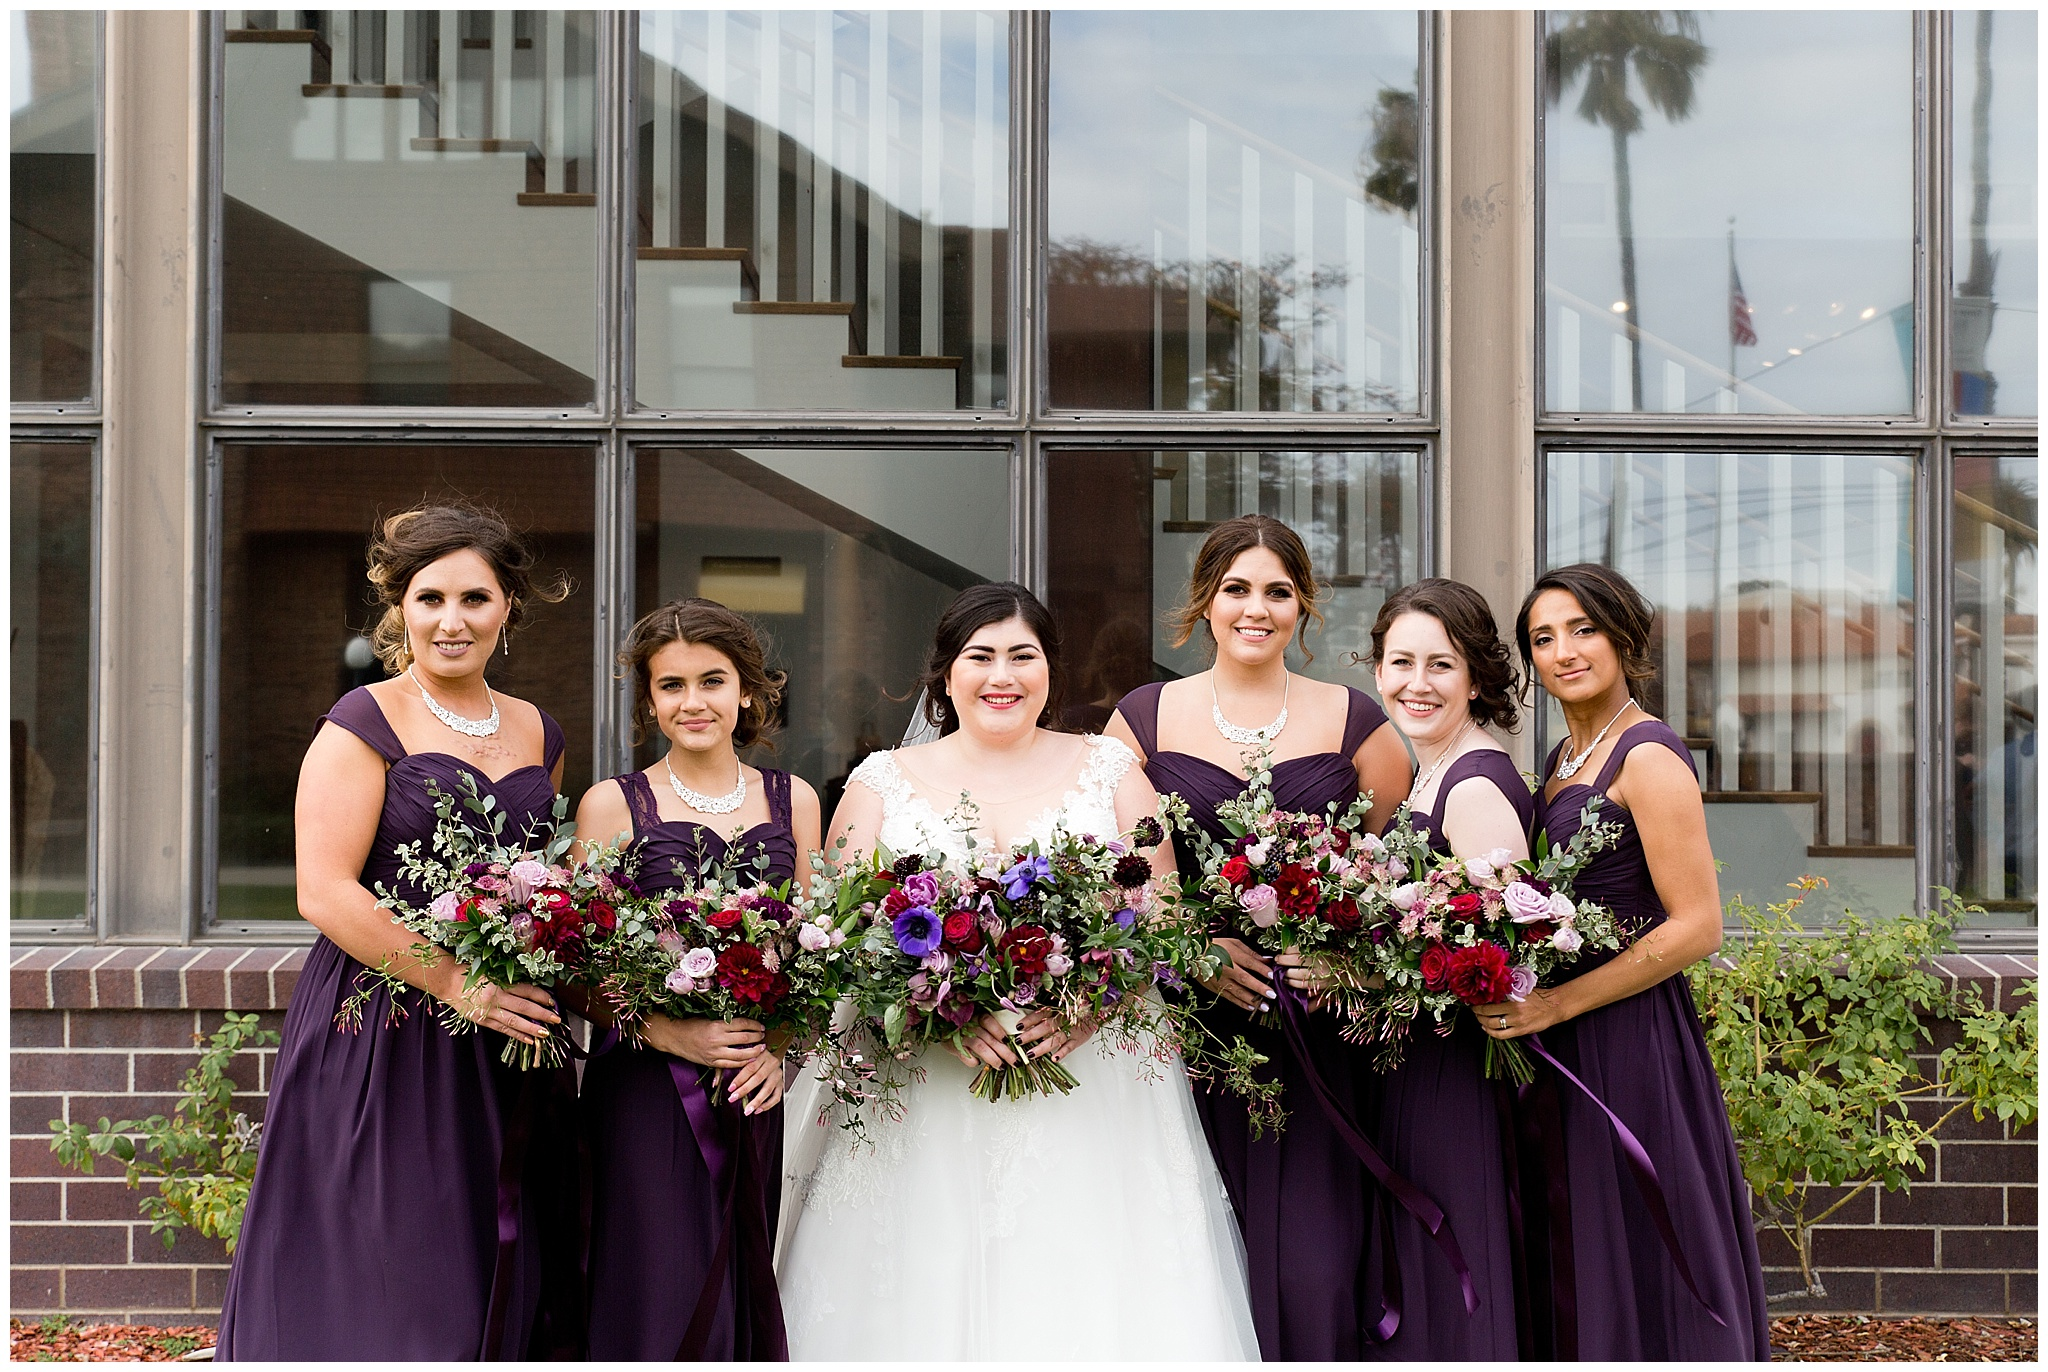 Carol_and_Grant_Wedding_3-3-18-7636.jpg